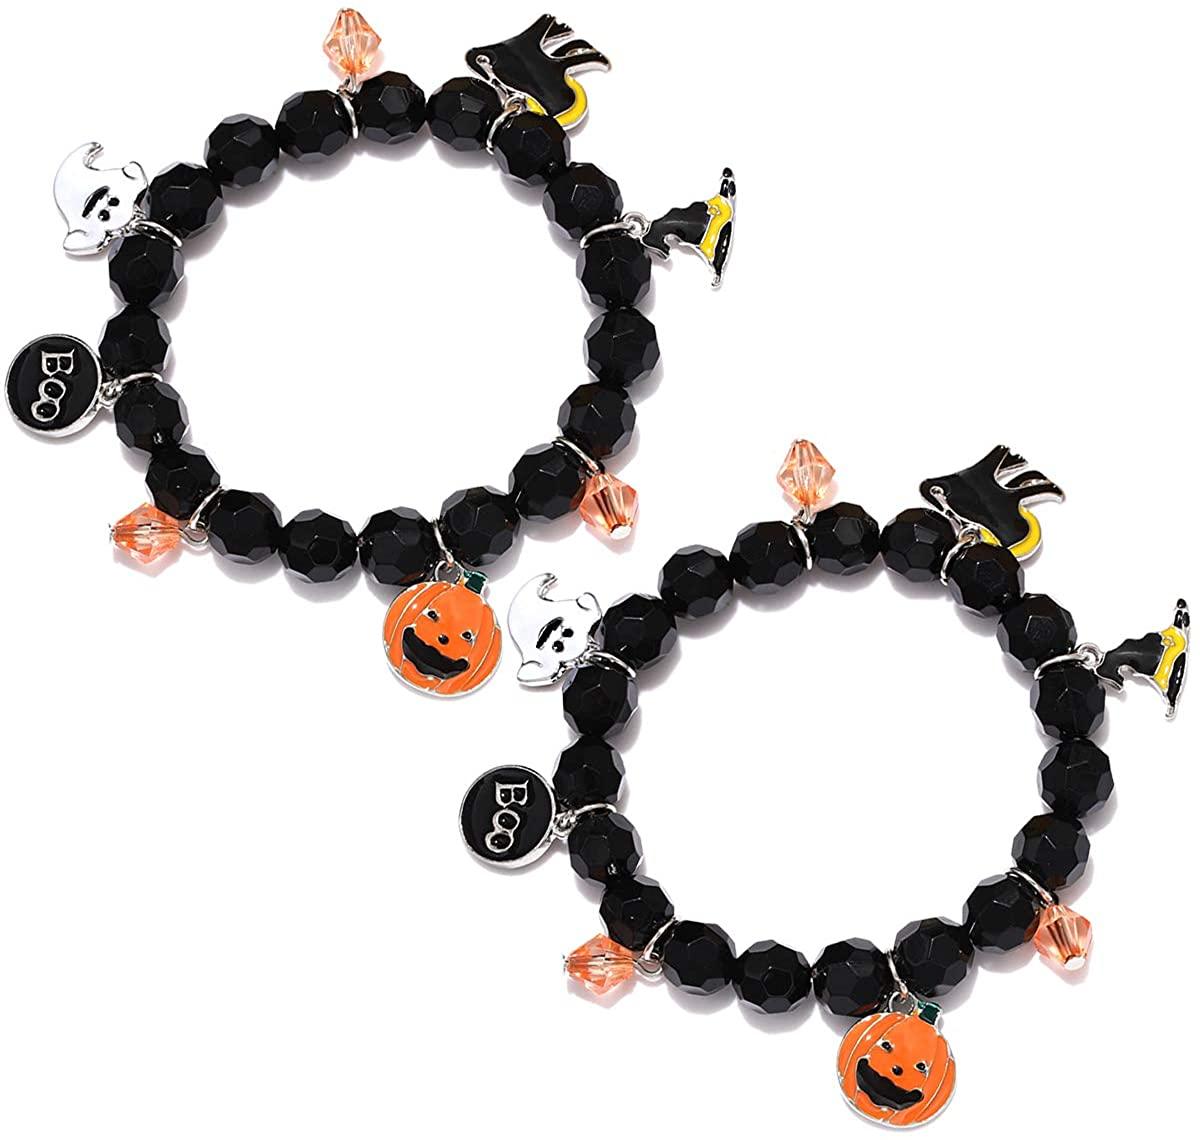 NVENF 2PCS Halloween Bracelets for Women Girls Pumpkin BOO Ghost Charm Bracelets Black Bead Stretch Bracelet Set Costume Party Gifts